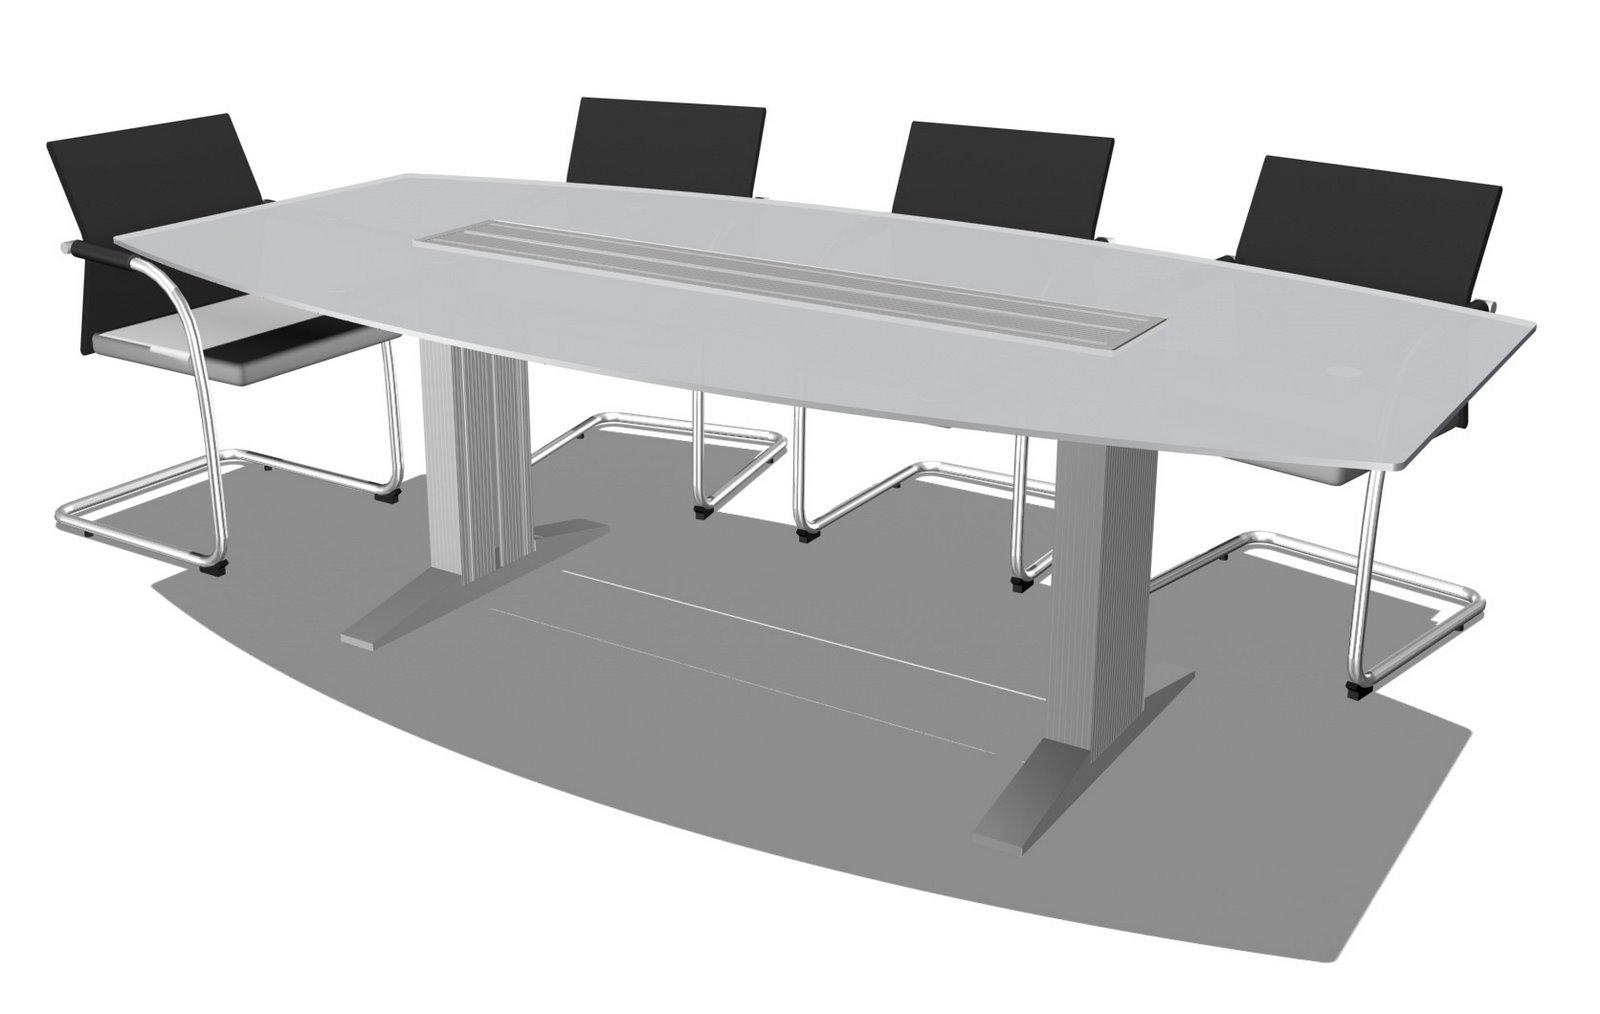 mesas madera mesa de reuniones portico vidrio view